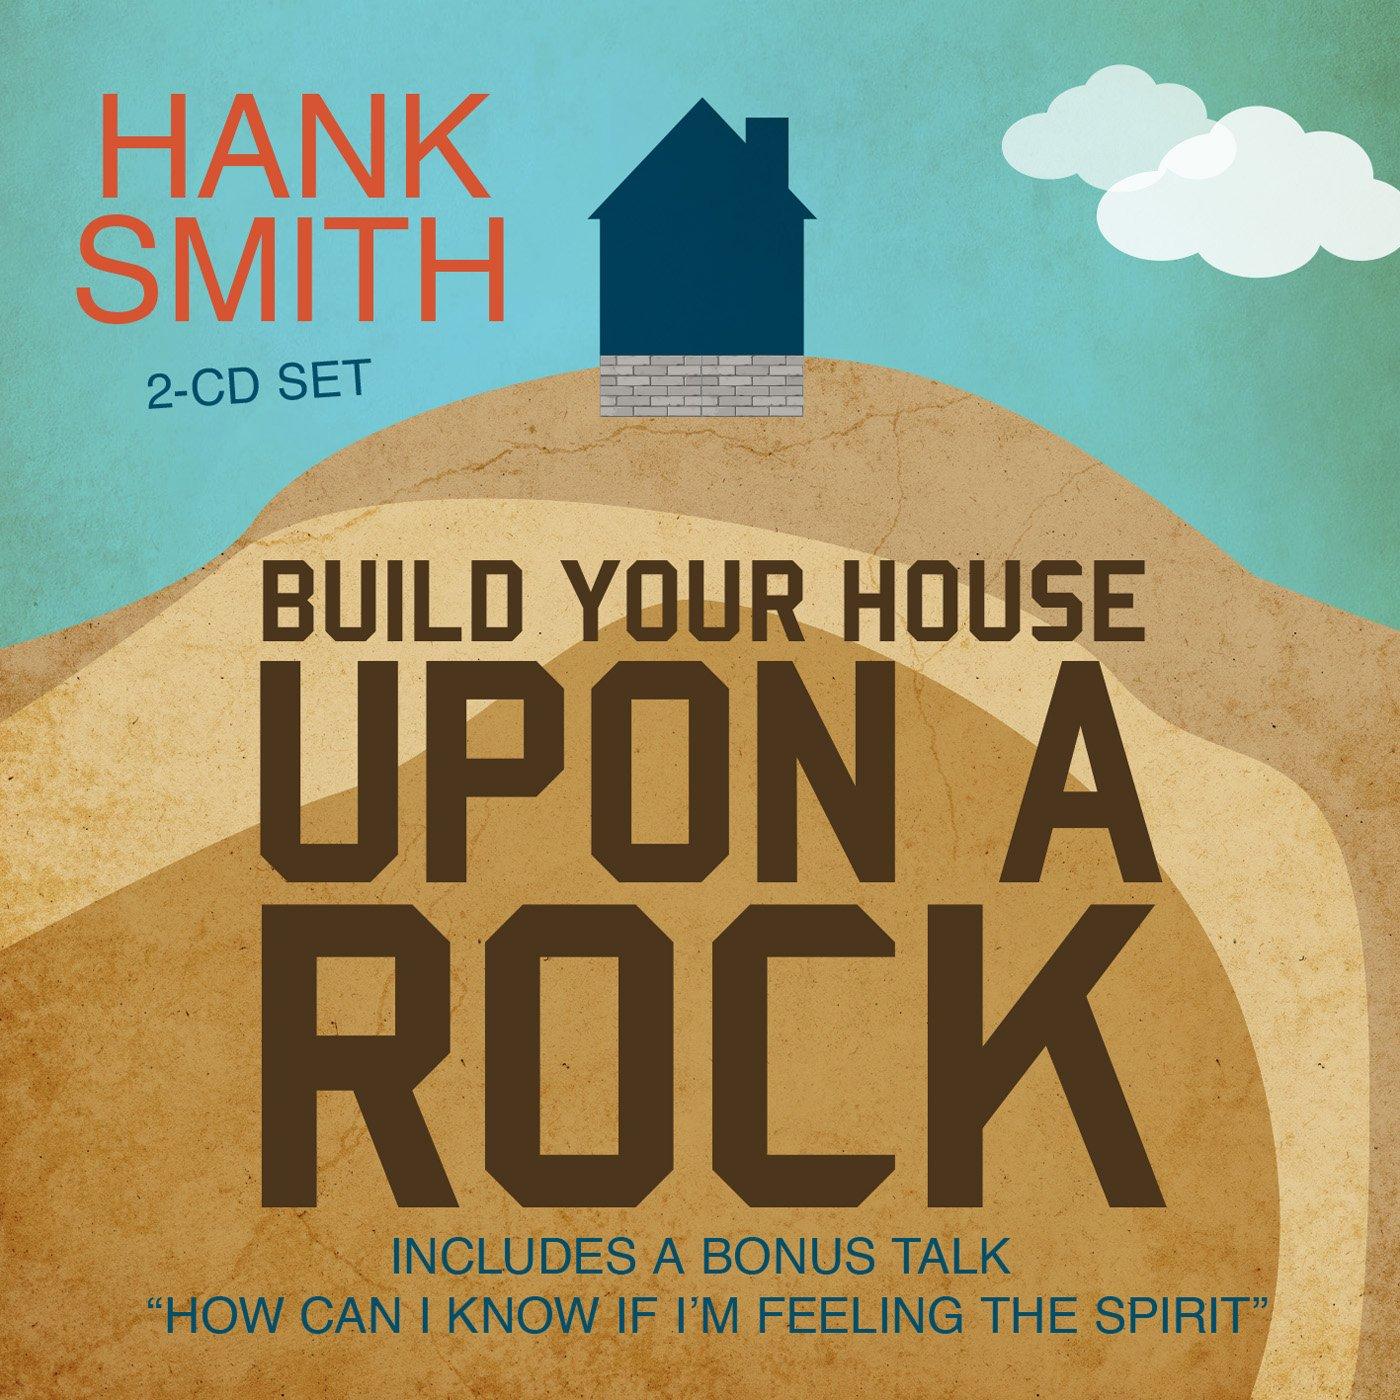 Build Your House Upon A Rock: Hank Smith: 9781524400057: Amazon.com: Books